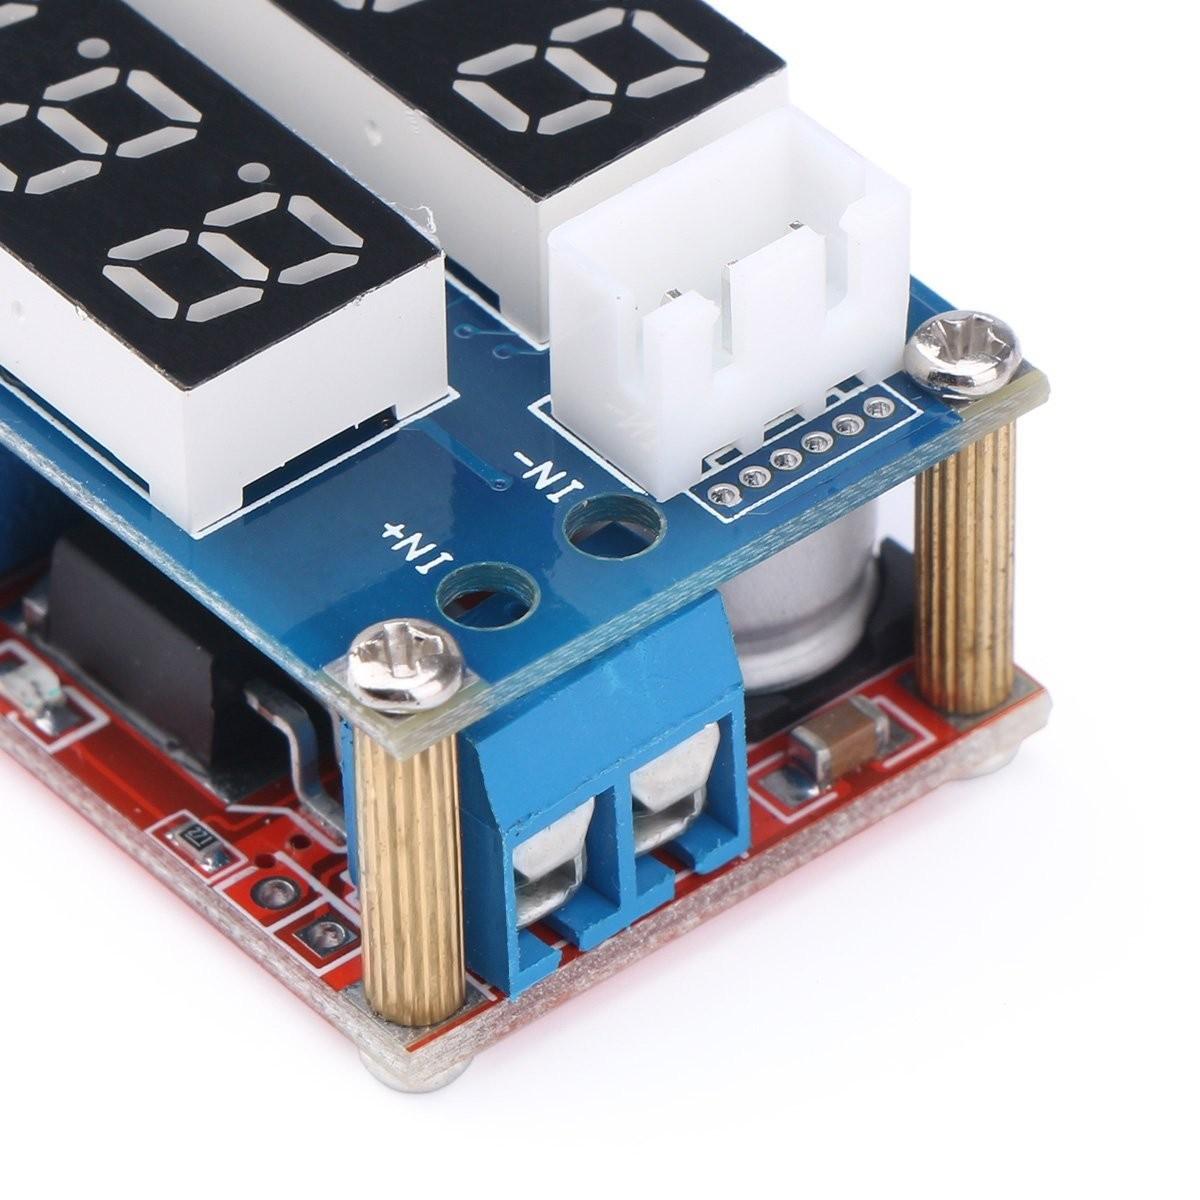 Riorand Dc Converter Buck Regulator 5v 30v To 08 29v Constant Lightbox Moreview